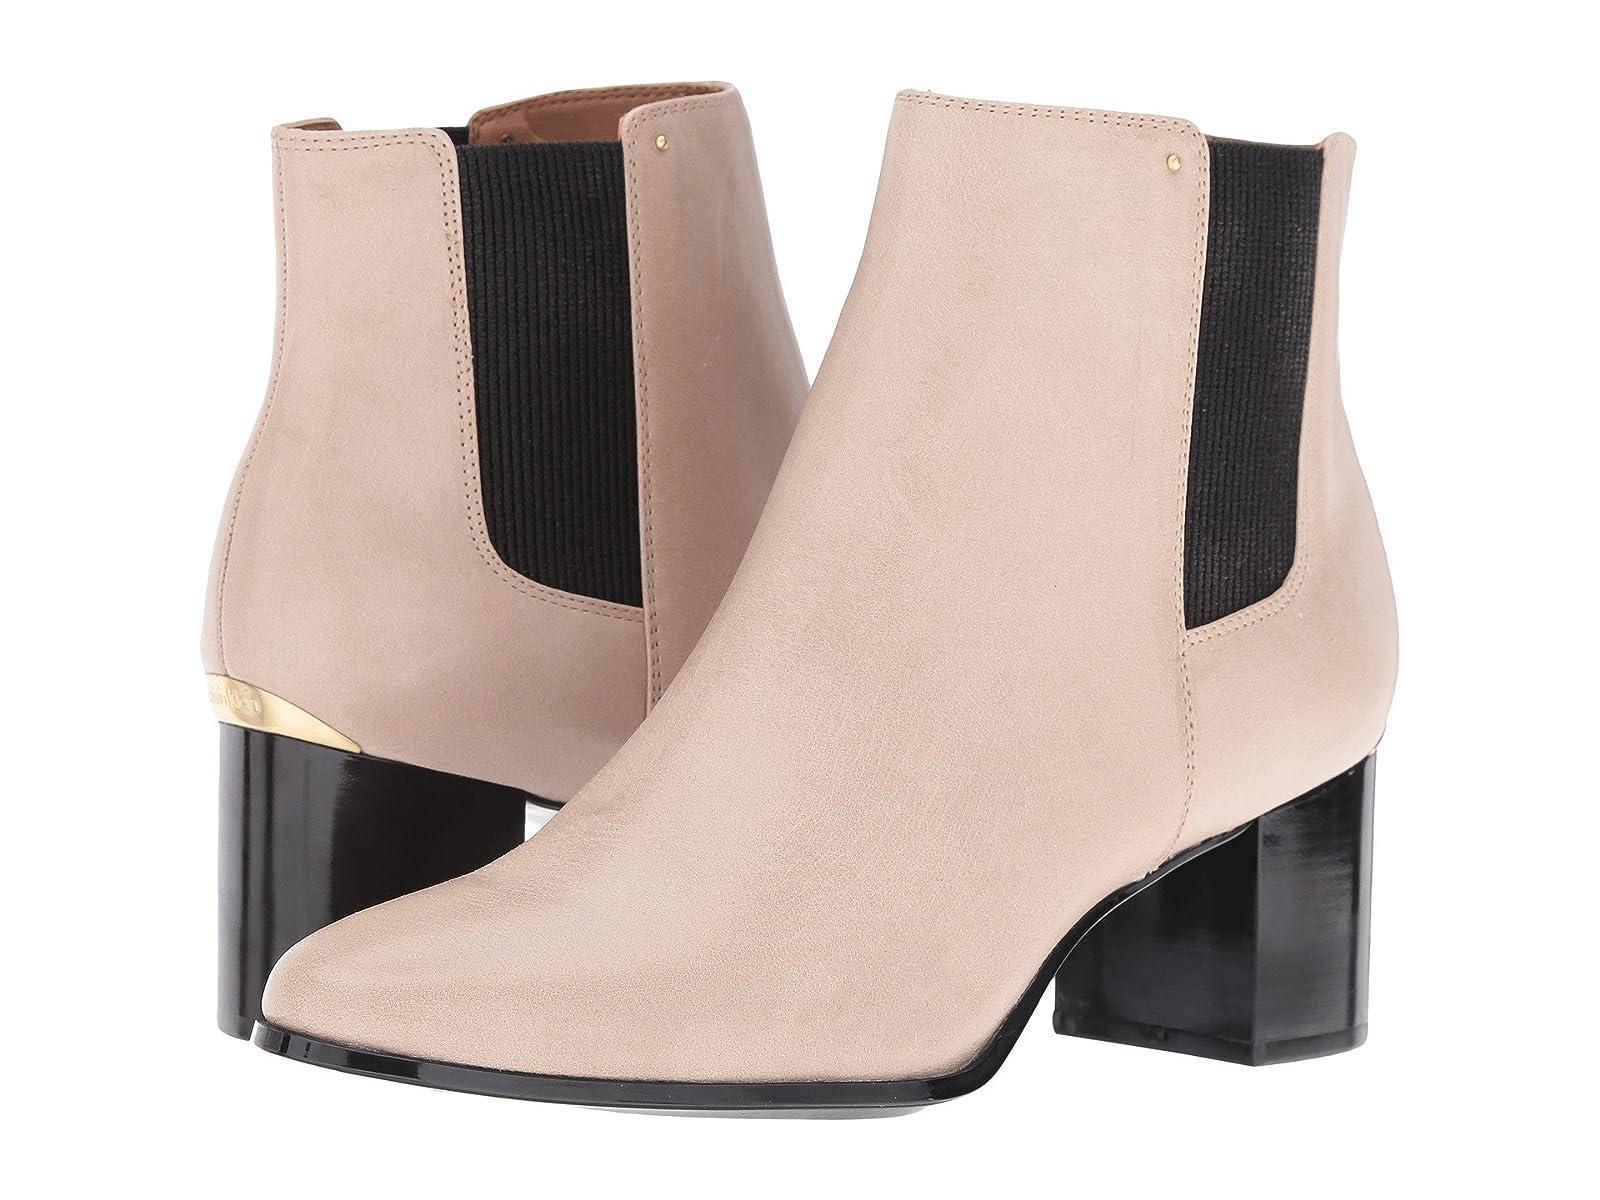 Calvin Klein FeldaCheap and distinctive eye-catching shoes